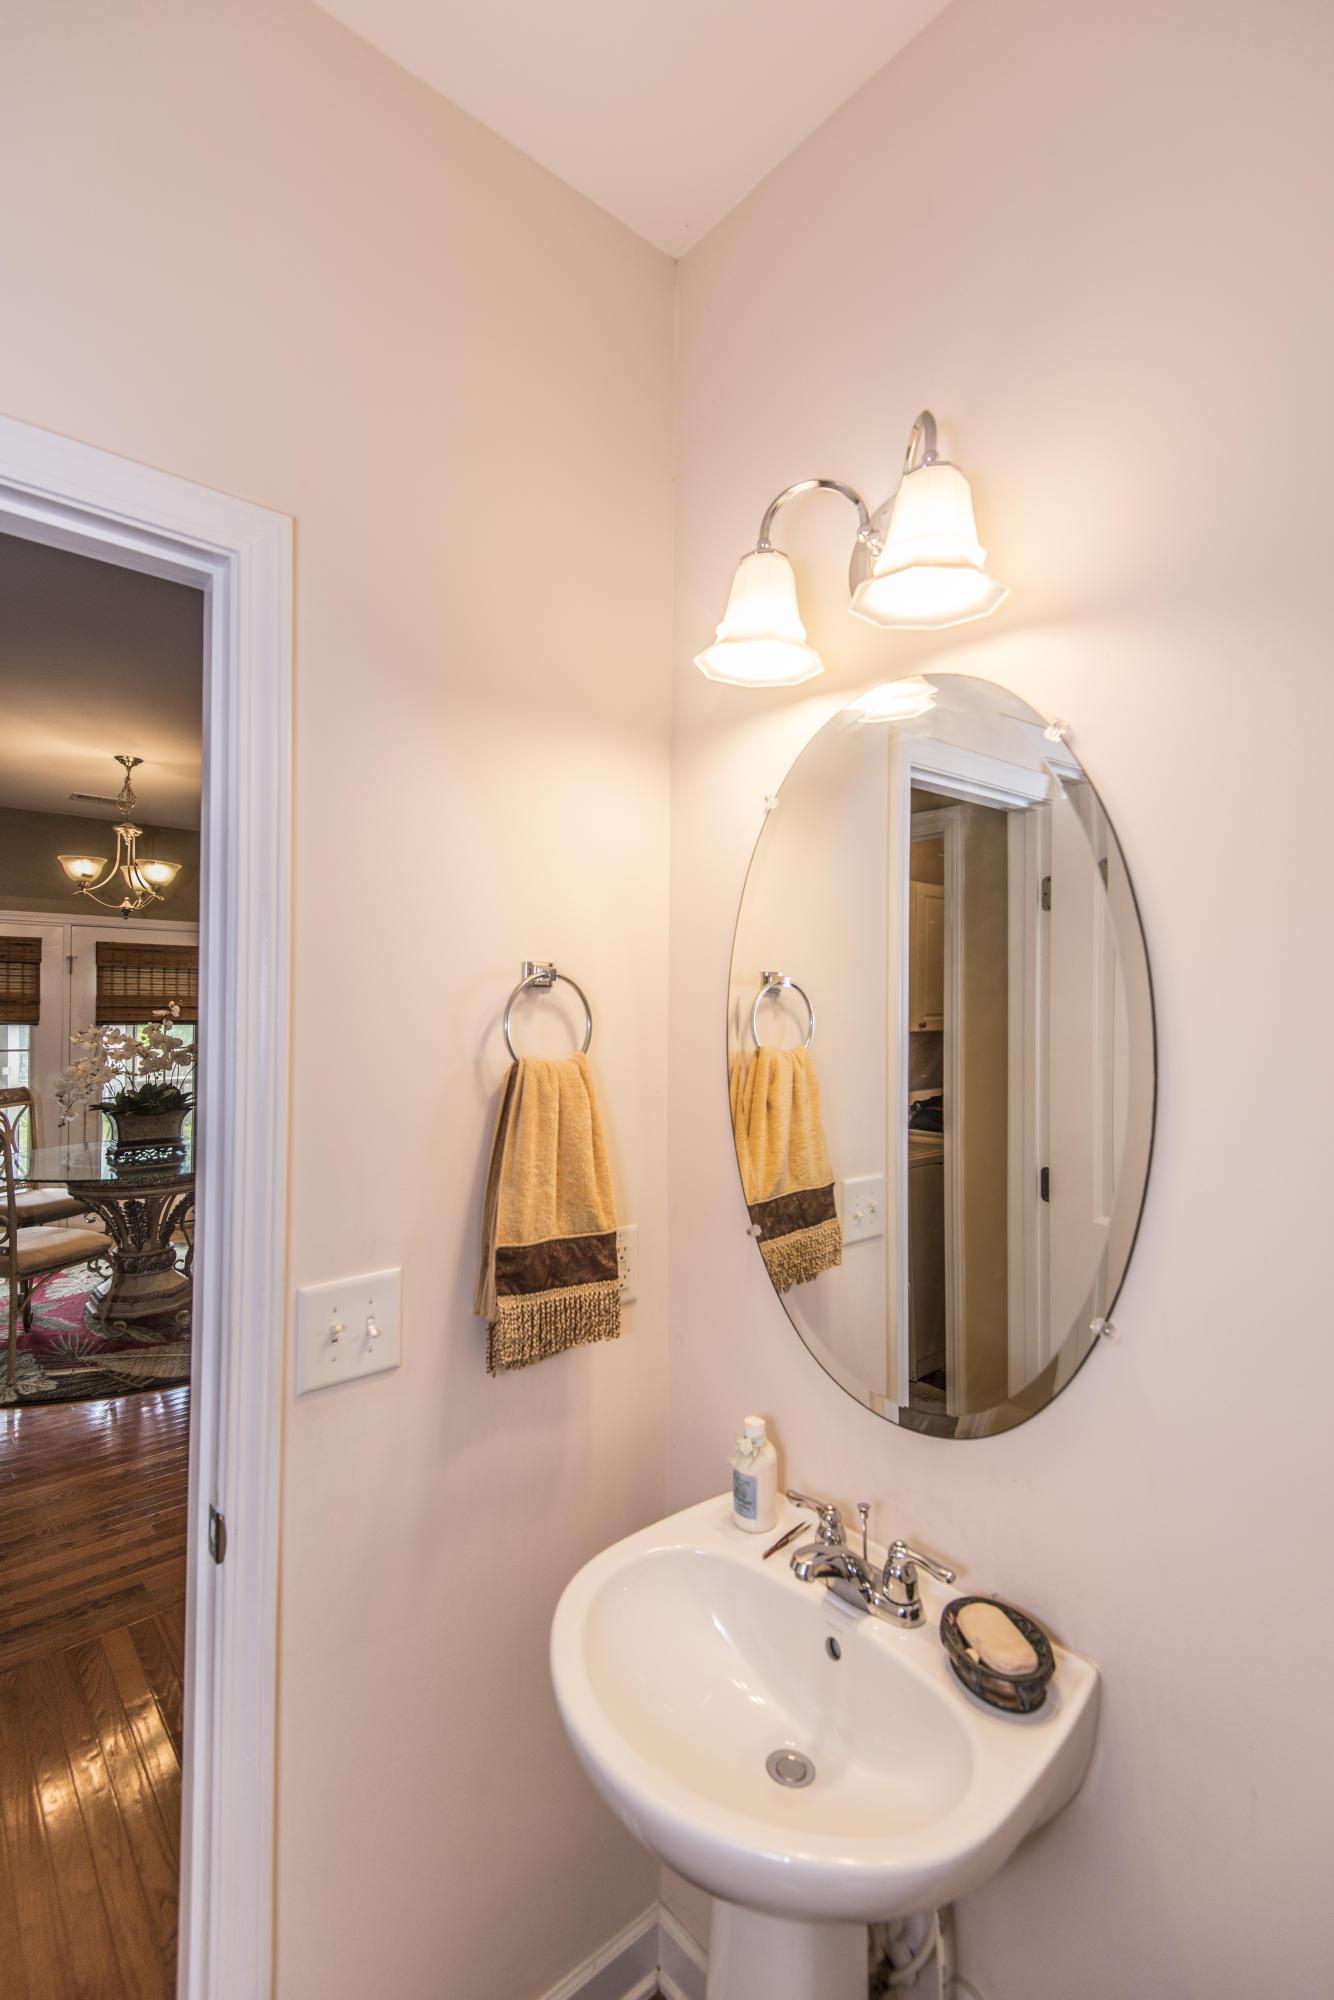 Hunt Club Phase II Homes For Sale - 1230 White Tail, Charleston, SC - 17